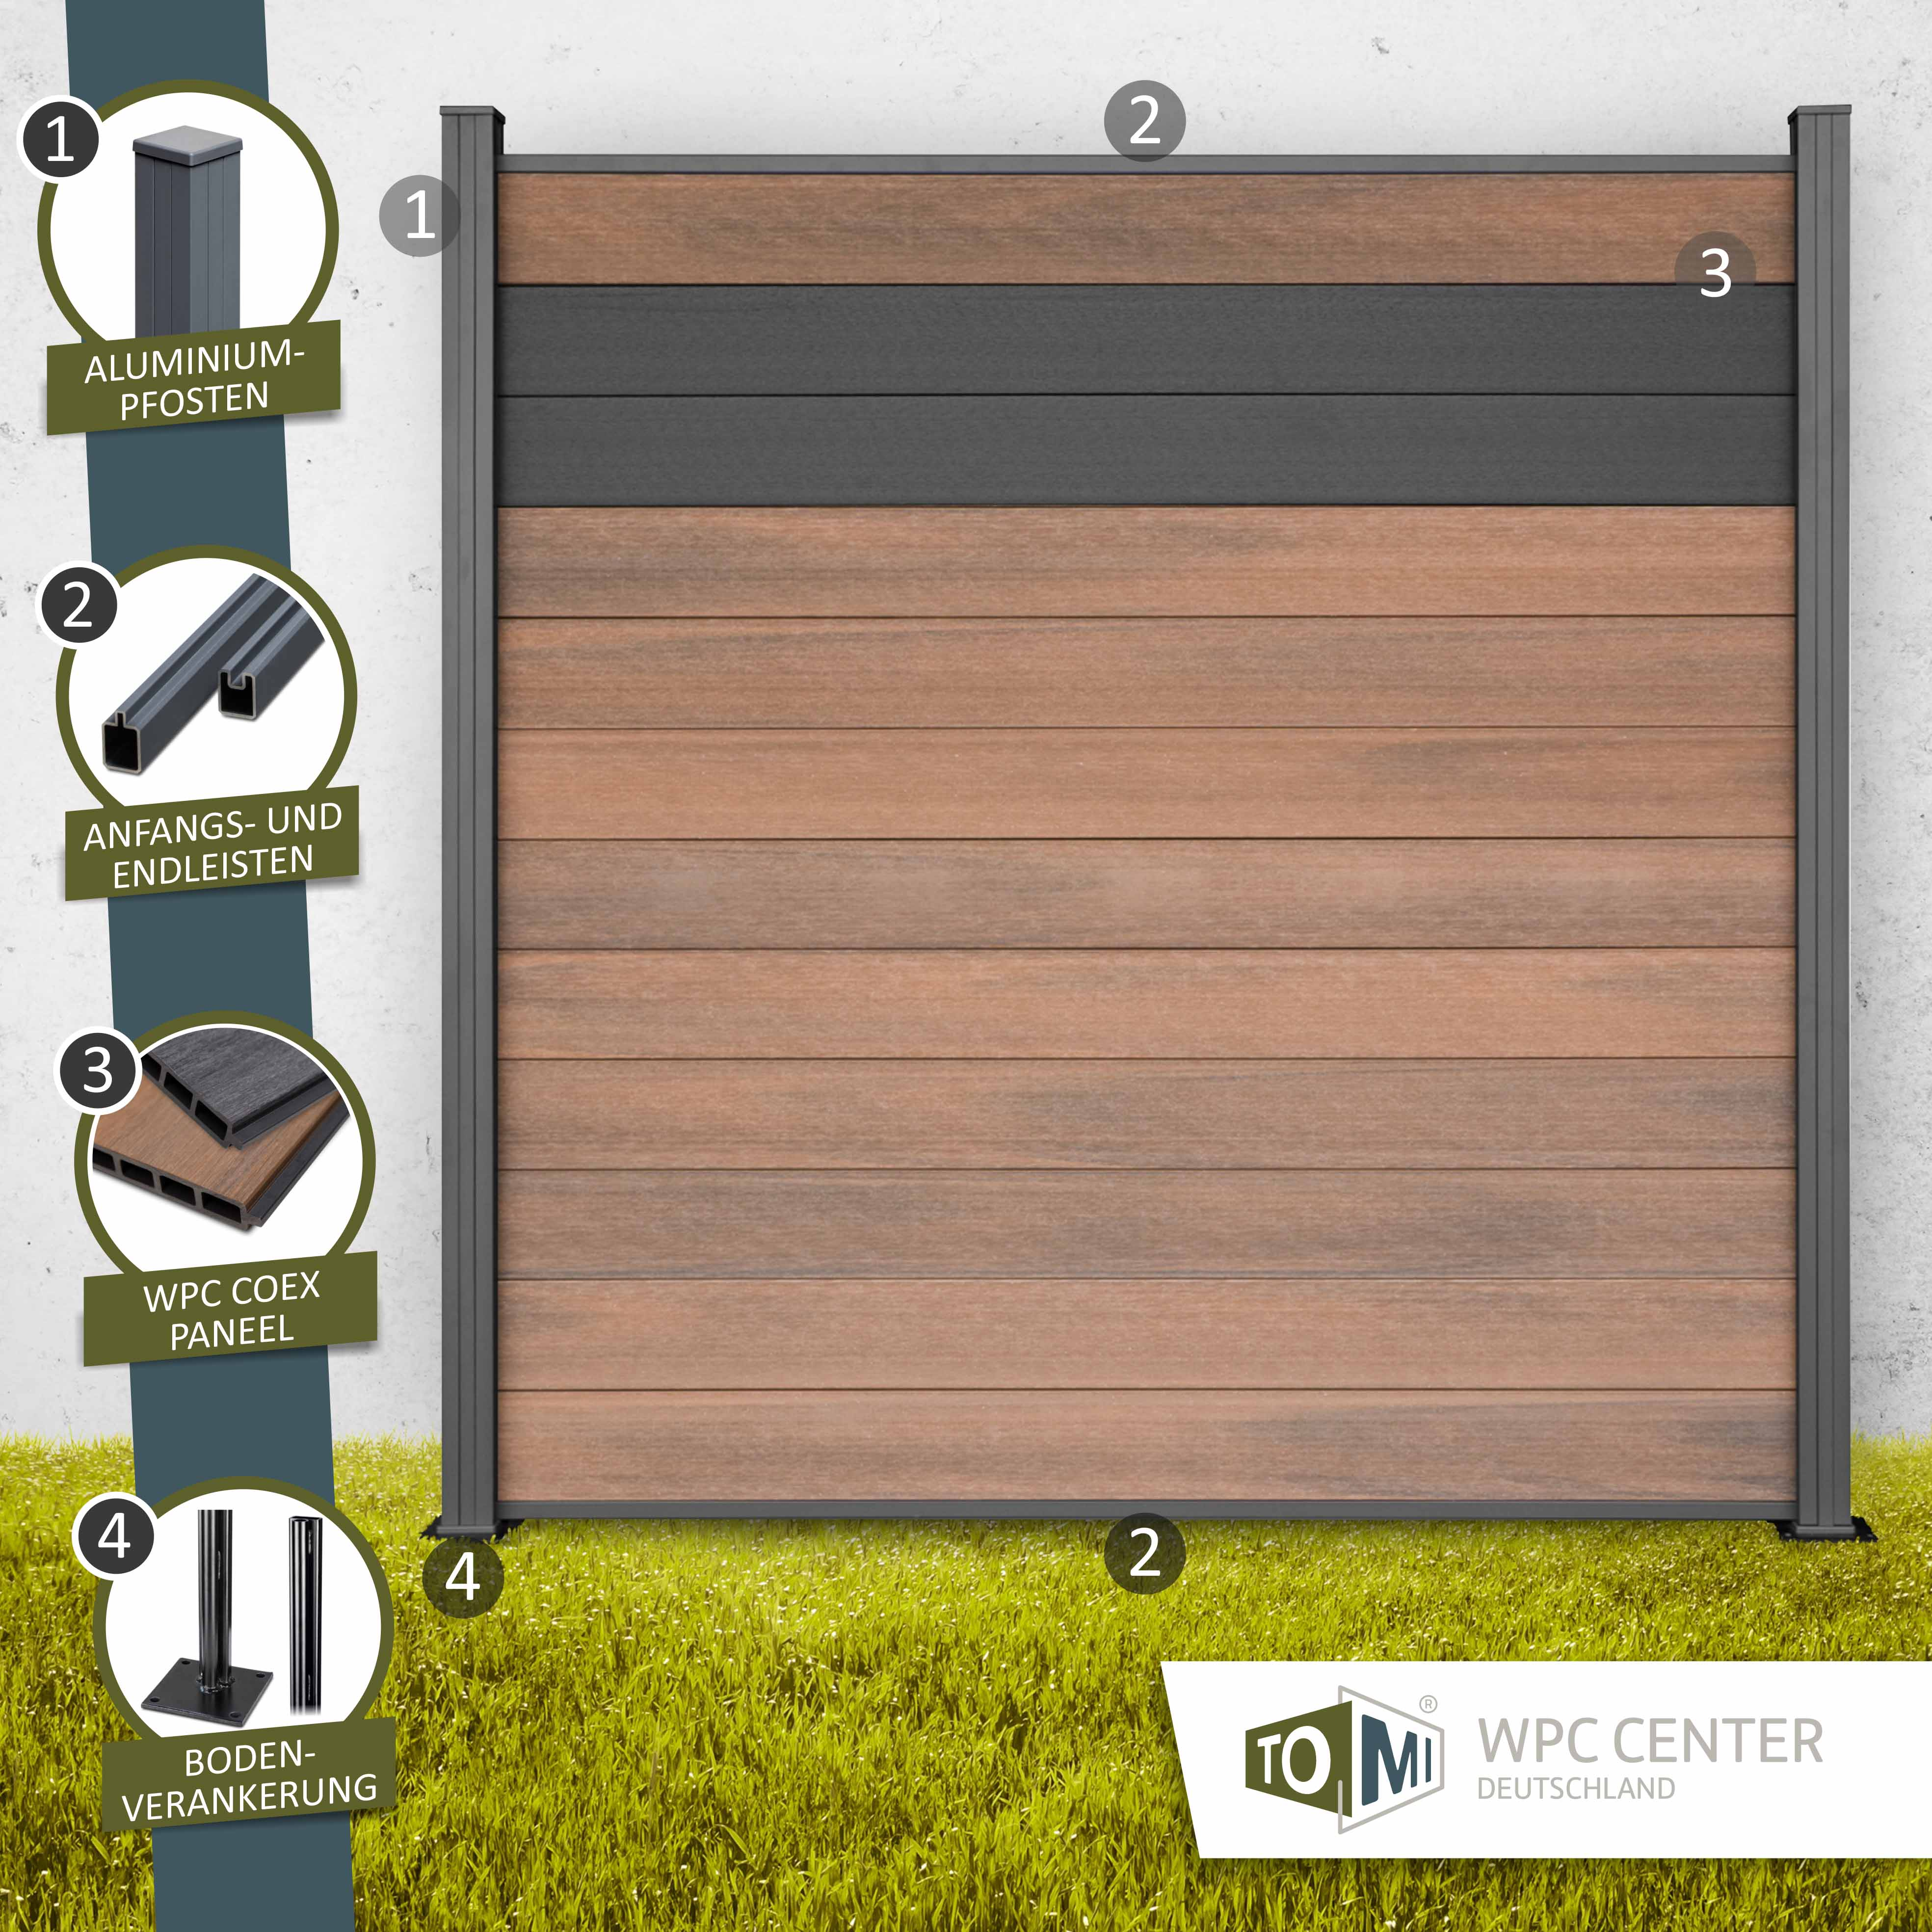 Wpc Coex Premium Line Bicolor Zaun Sichtschutzzaun Nussbraun Anthrazit